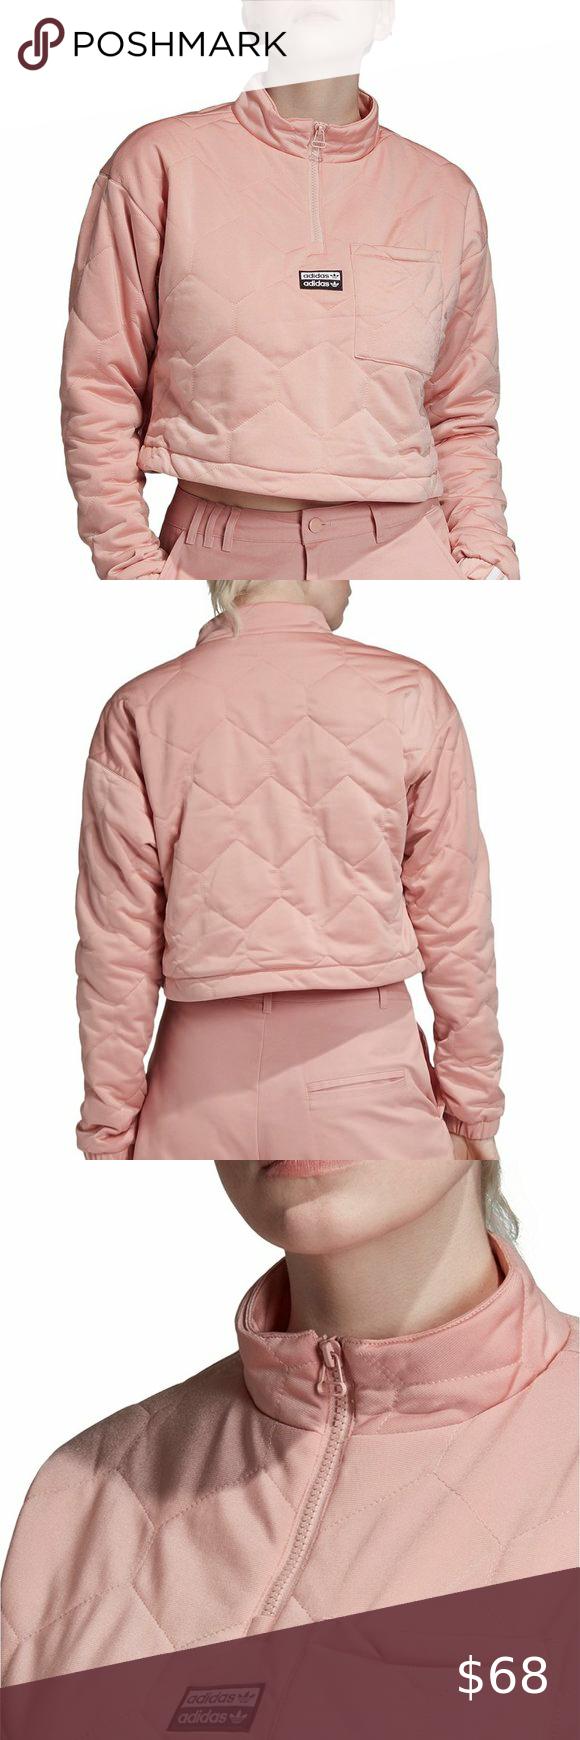 Adidas Quilted Half Zip Cropped Sweatshirt Adidas Crop Sweater Adidas Crop Crop Sweatshirt [ 1740 x 580 Pixel ]